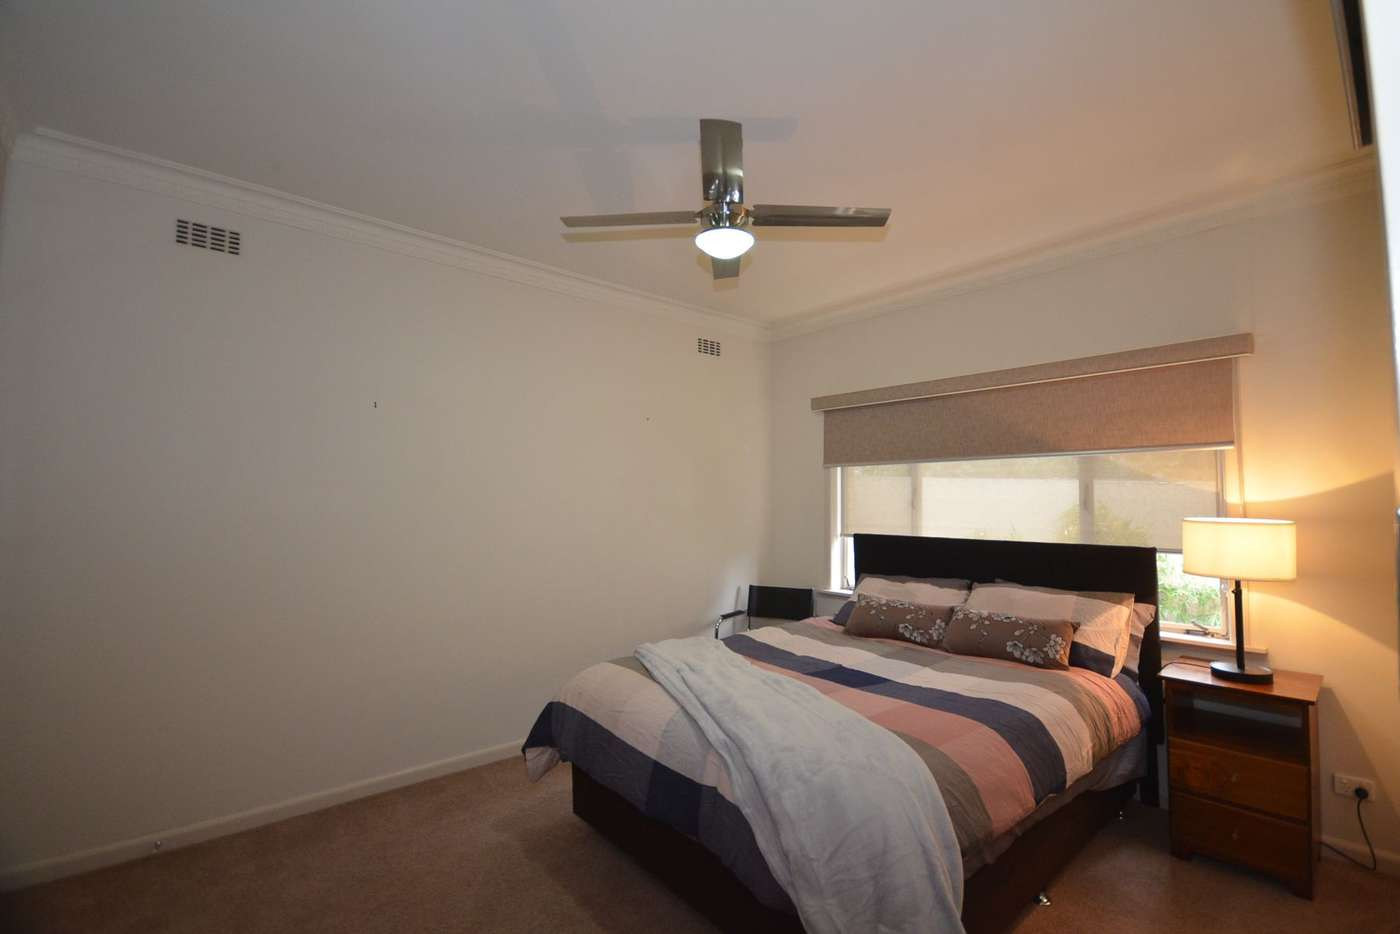 Seventh view of Homely house listing, 8 Waterloo Street, Bendigo VIC 3550